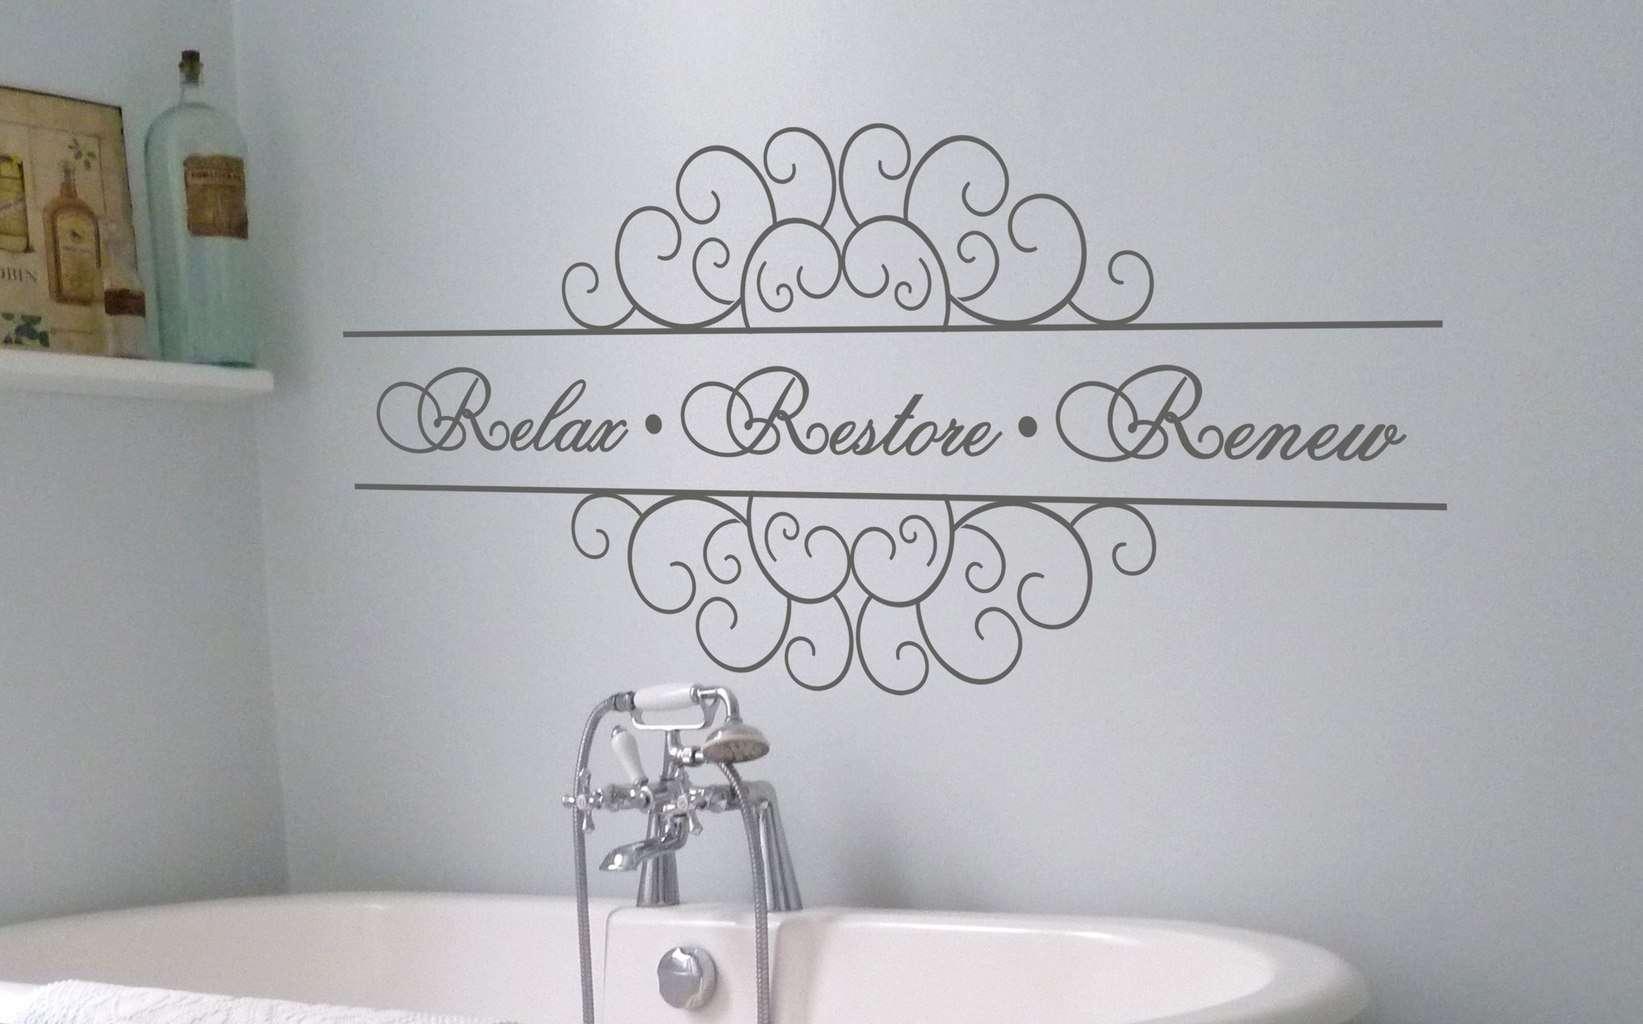 Relax Restore Renew Wall Art Decal Bathroom Decal